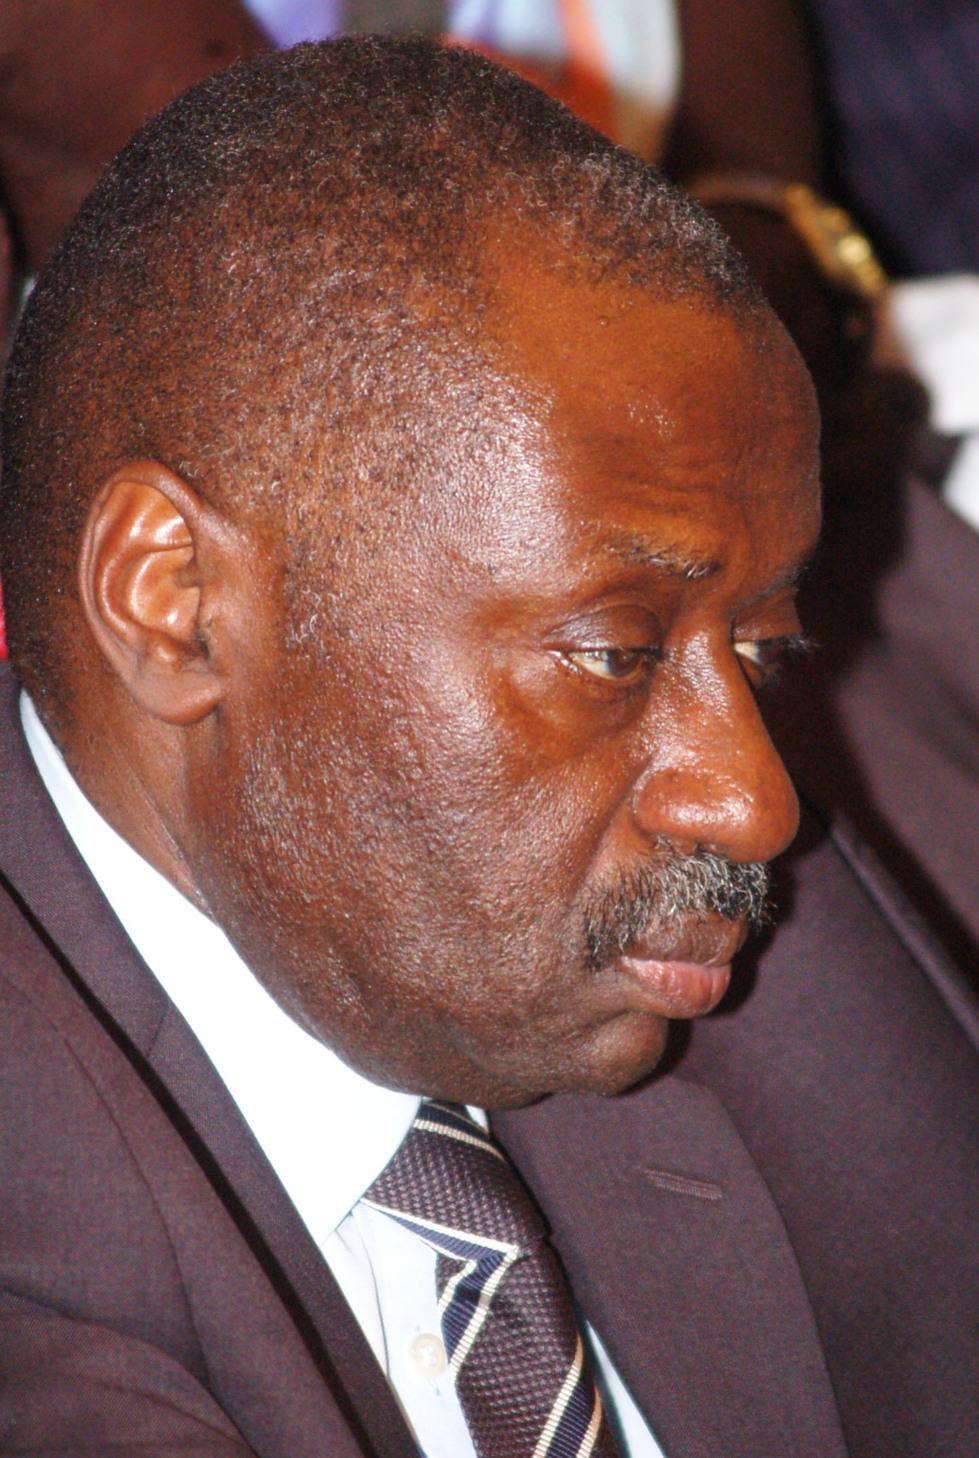 Boycott du procès: Les avocats de Mbaye Ndiaye trahissent le pacte